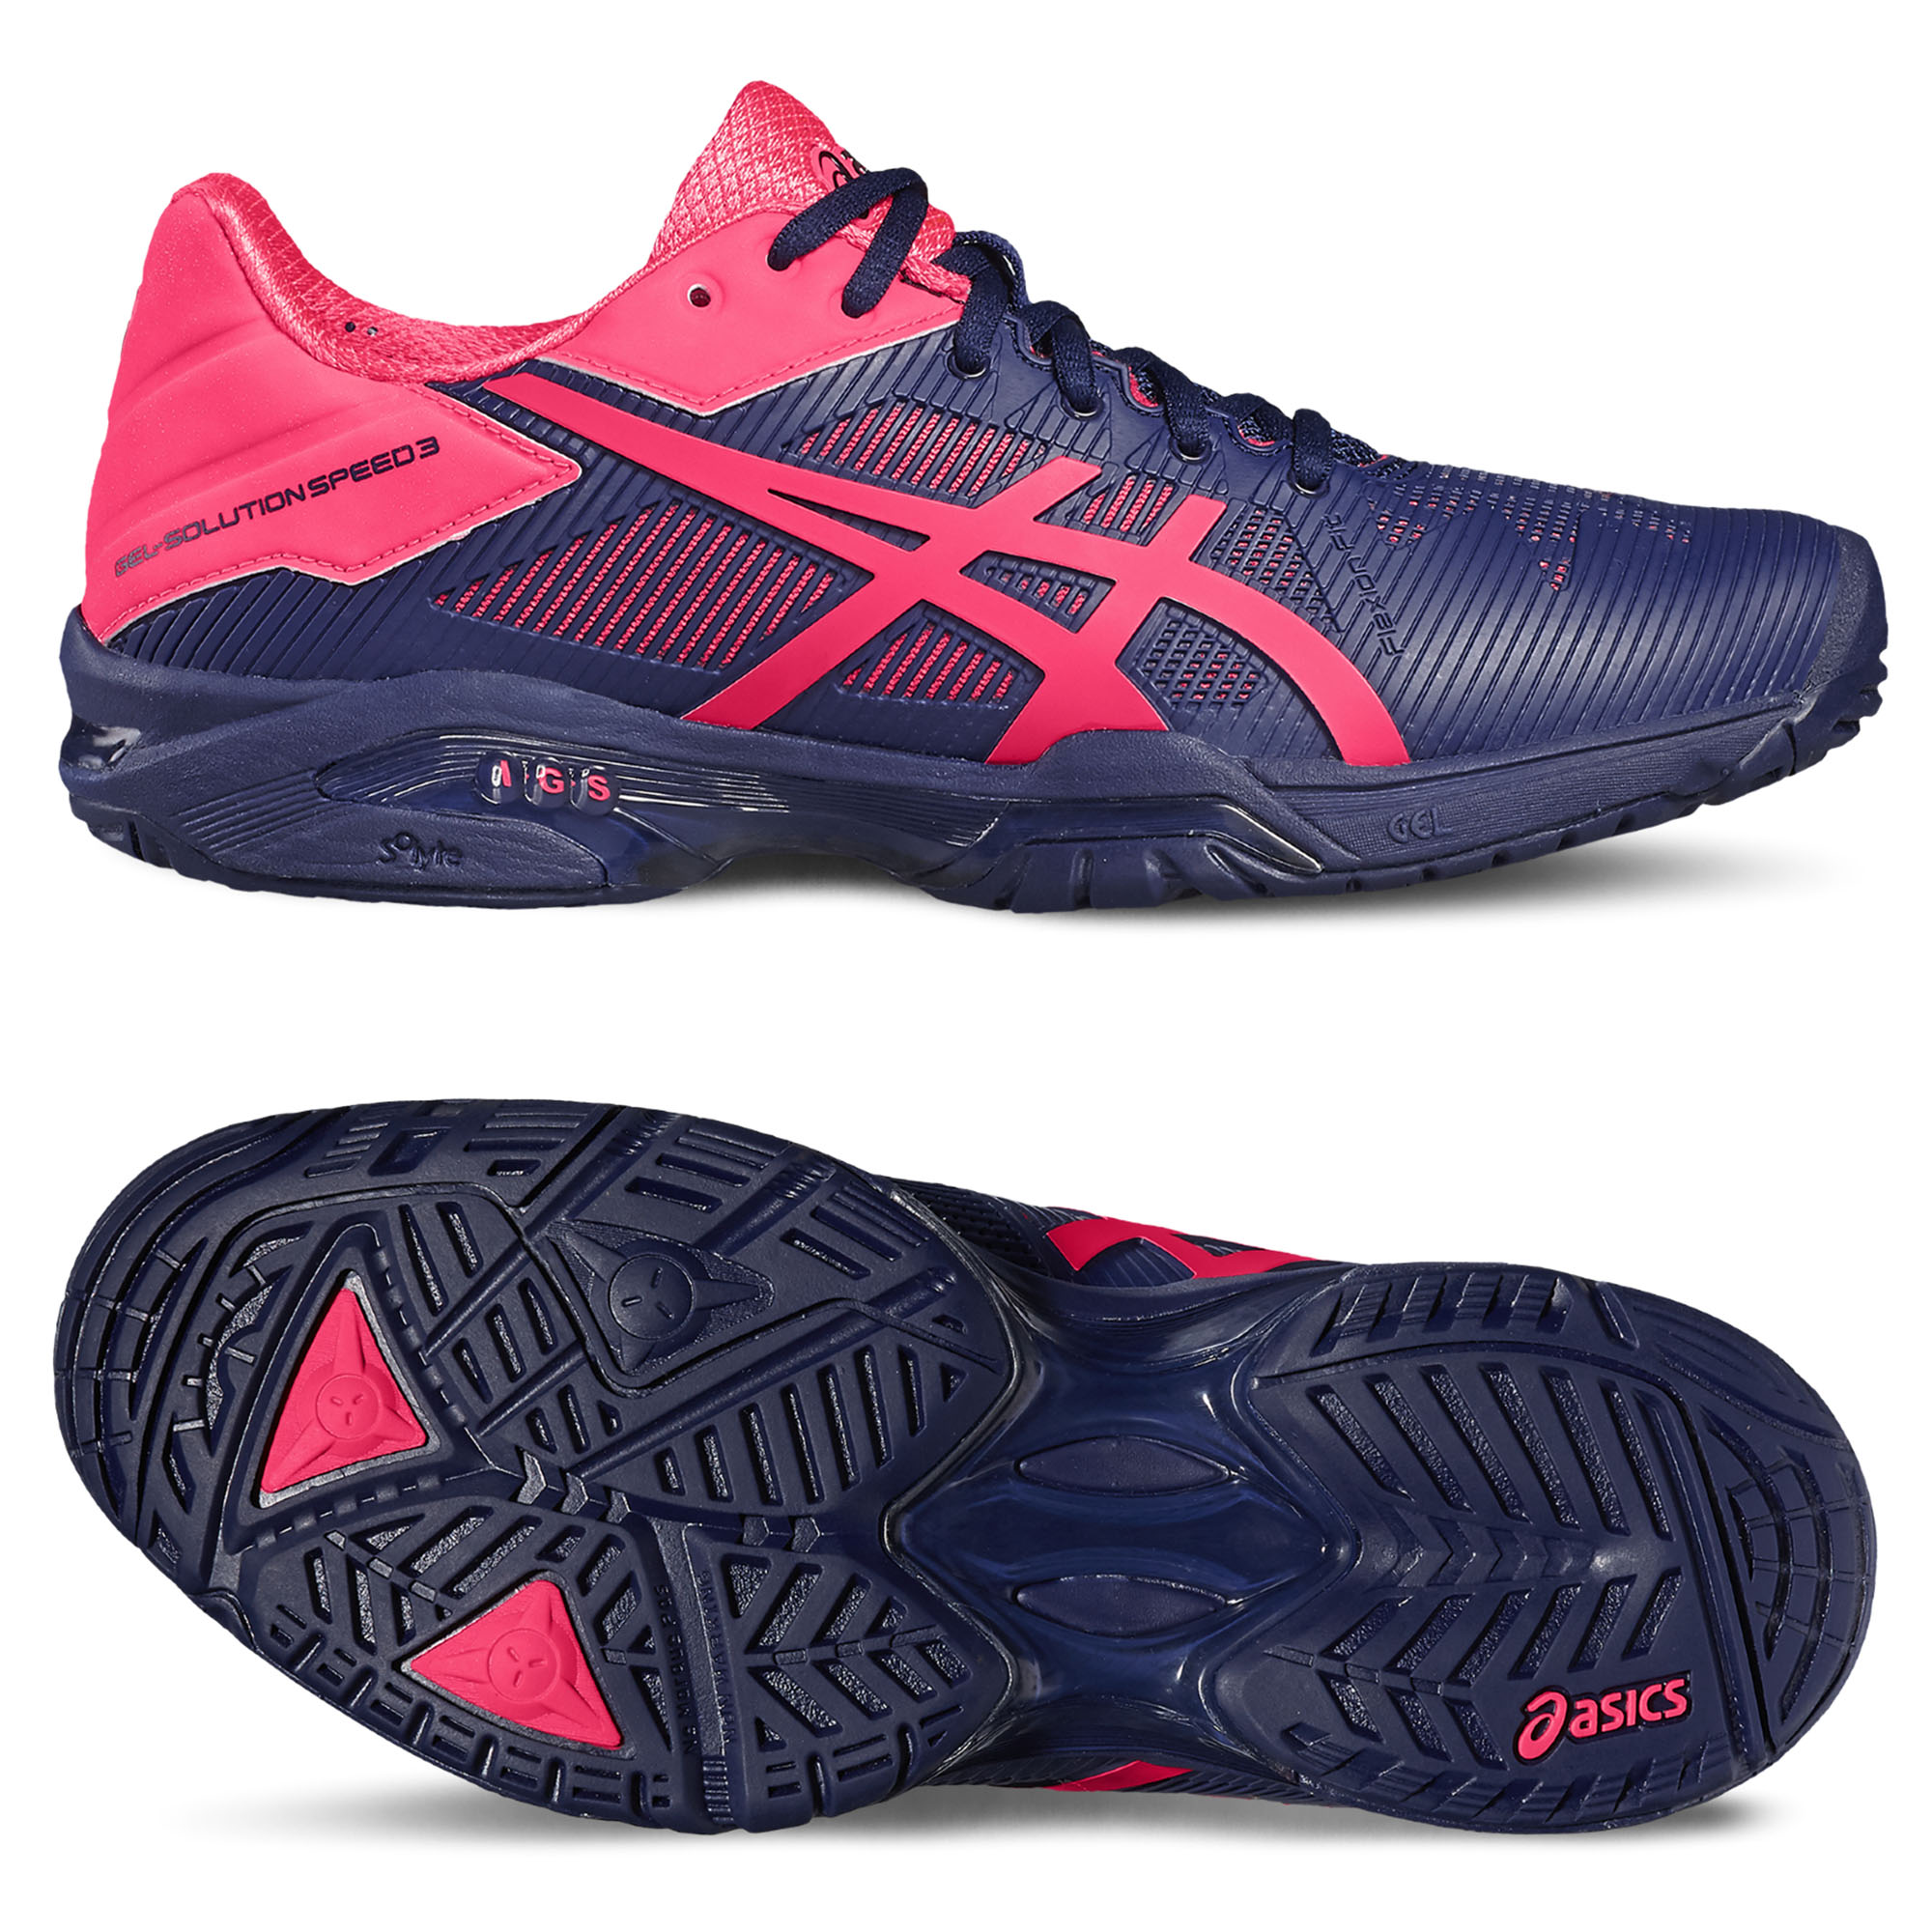 Asics GelSolution Speed 3 Ladies Tennis Shoes SS17  6.5 UK